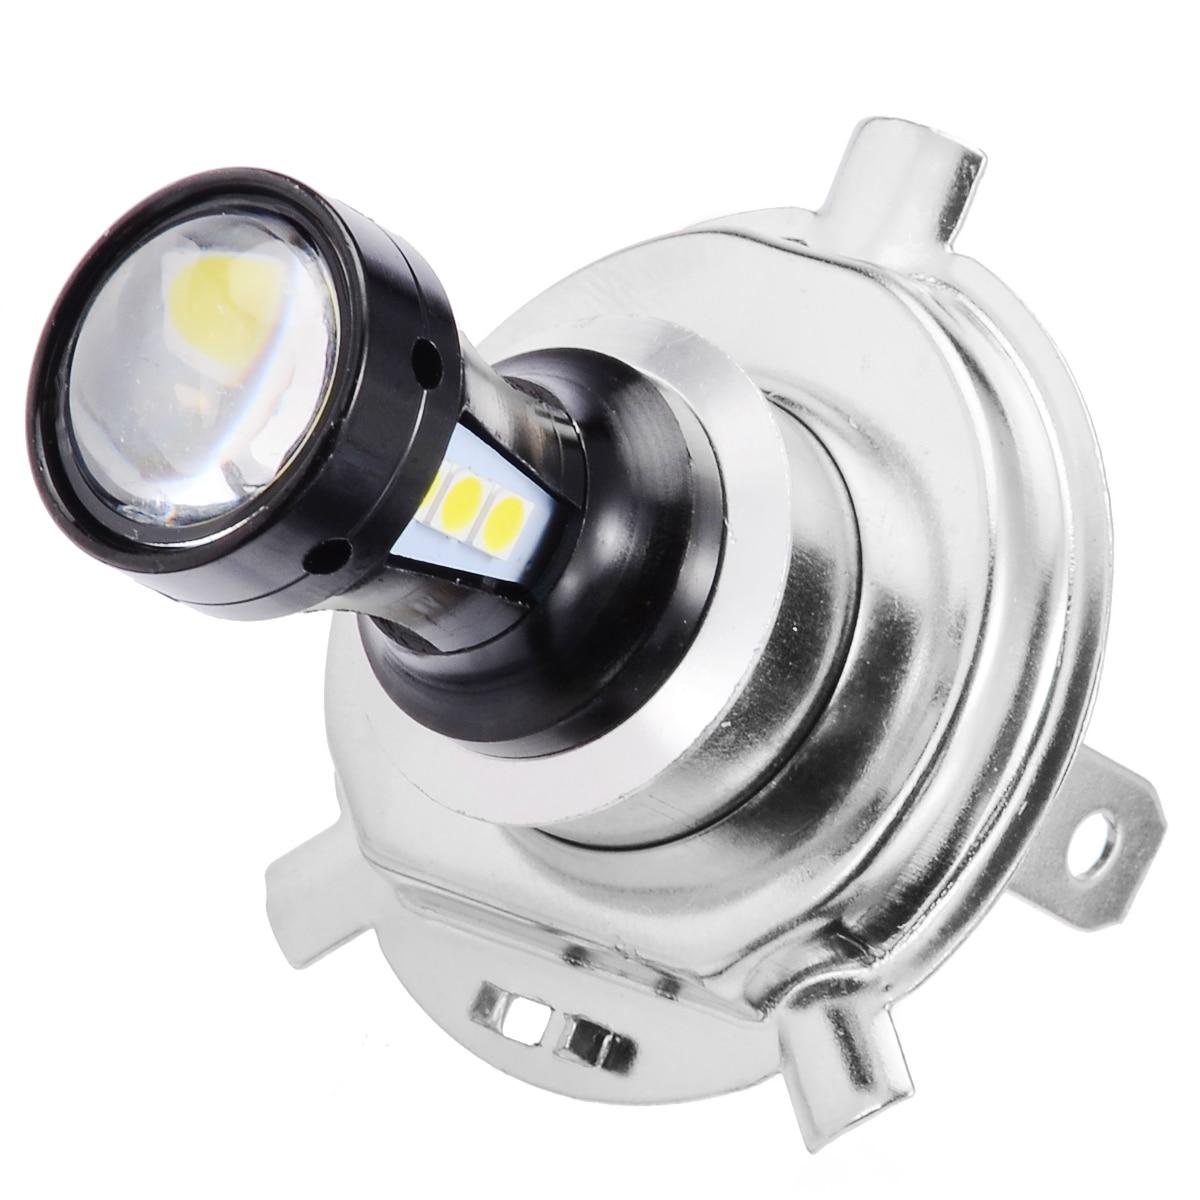 Mayitr 1PC H4 Universal 6500K Motorcycle Headlight Head Light Lamp 3030 LED Bulb Hi-Lo Beam Wireless Direct Install For Yamaha